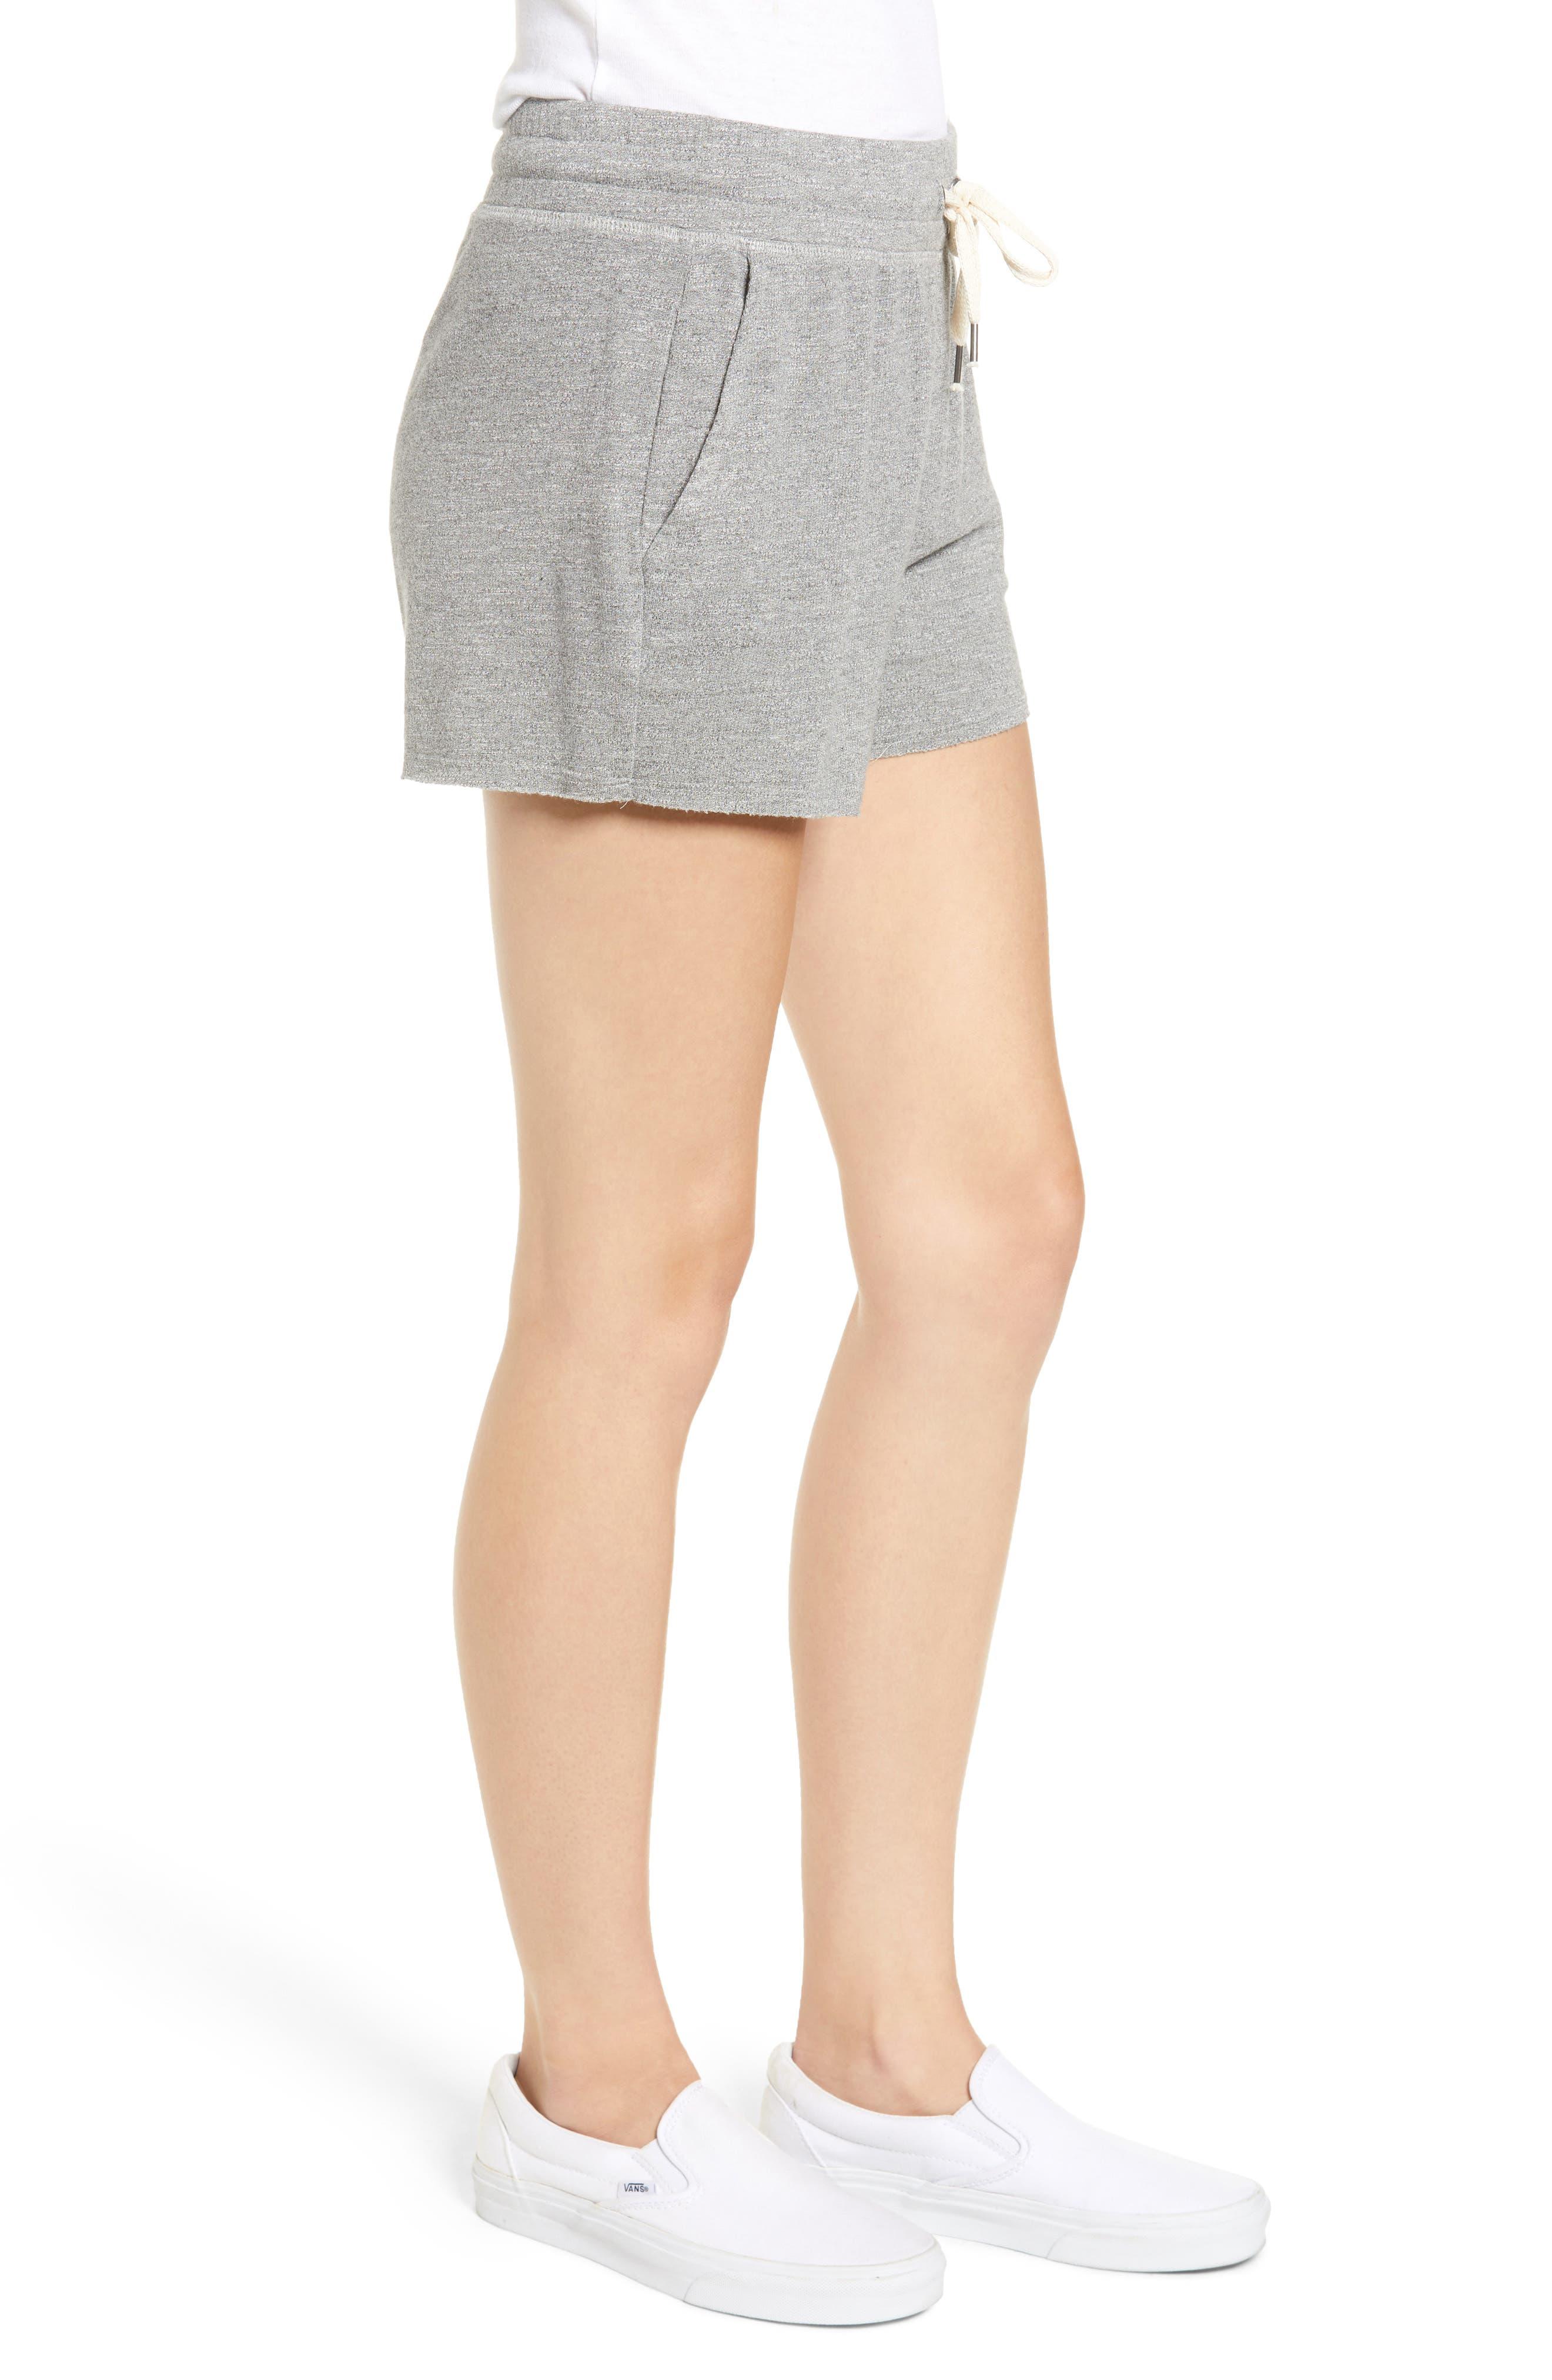 Active Shorts,                             Alternate thumbnail 3, color,                             HEATHER GREY